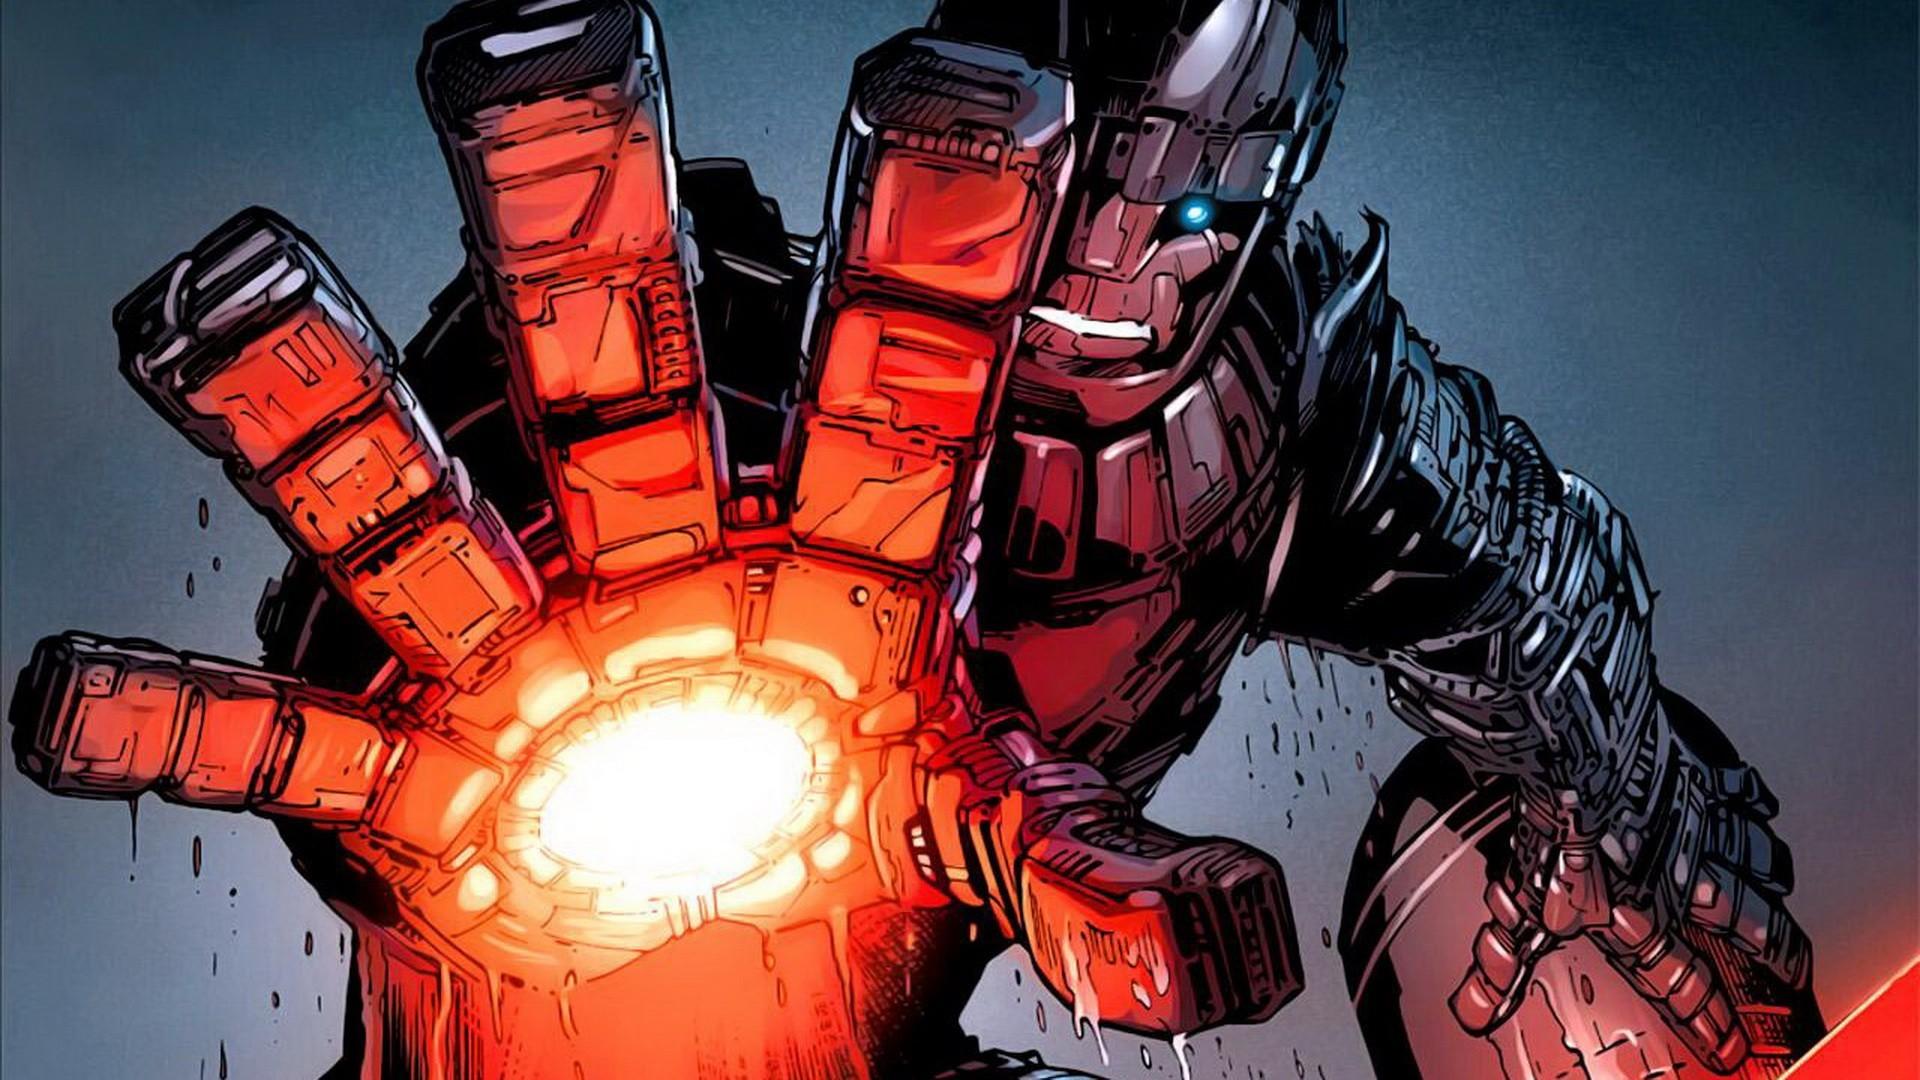 Top Wallpaper Marvel Xmen - X-Men-Sentinel-Marvel-Comics-680369  Perfect Image Reference_11569.jpg